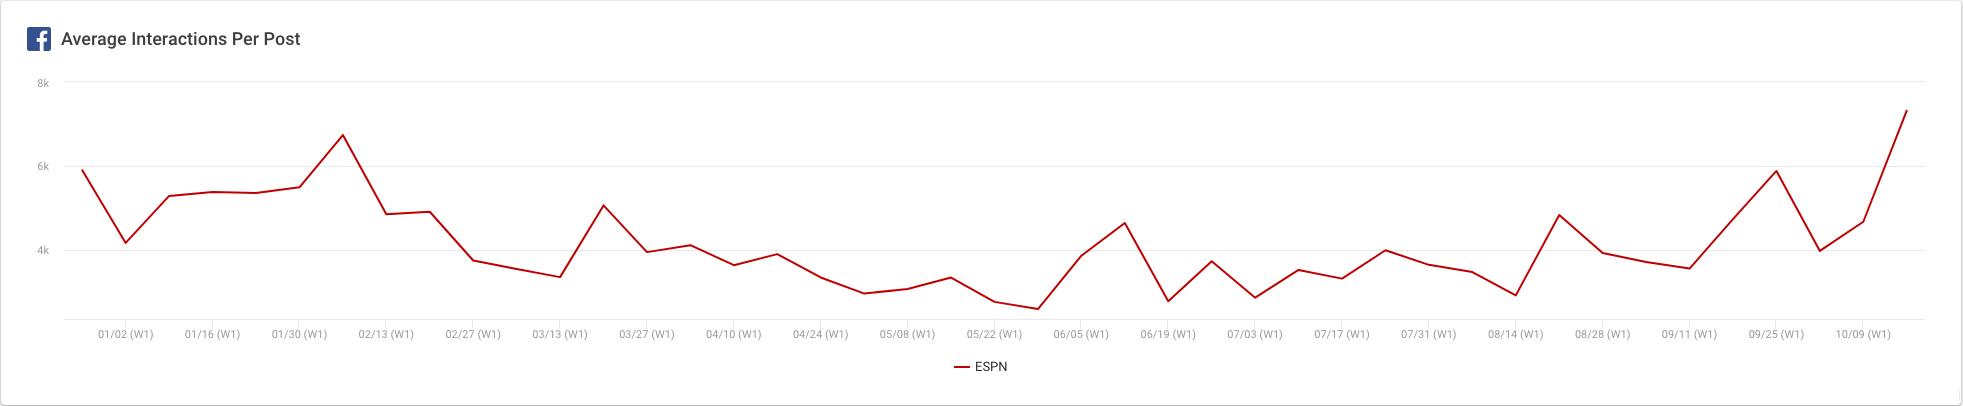 ESPN Engagement Facebook